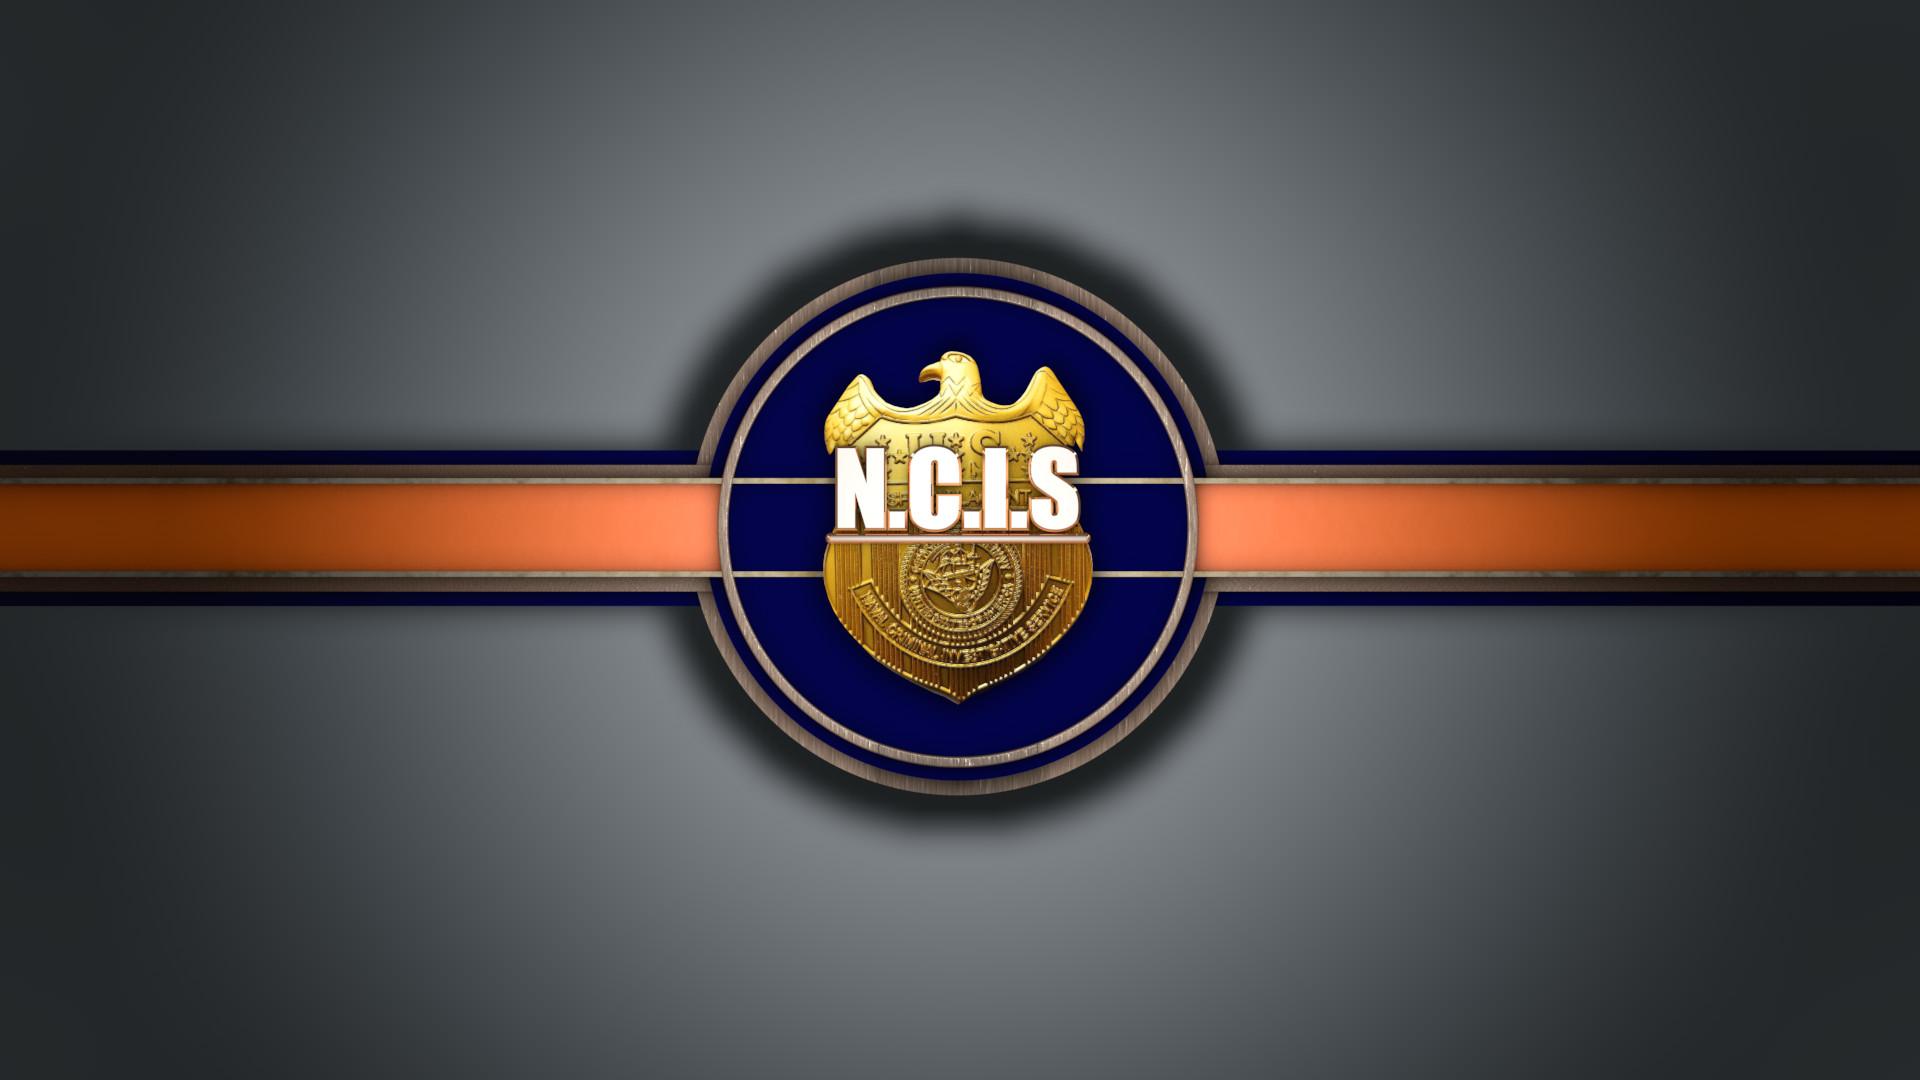 Ncis Logo Wallpaper 68 images